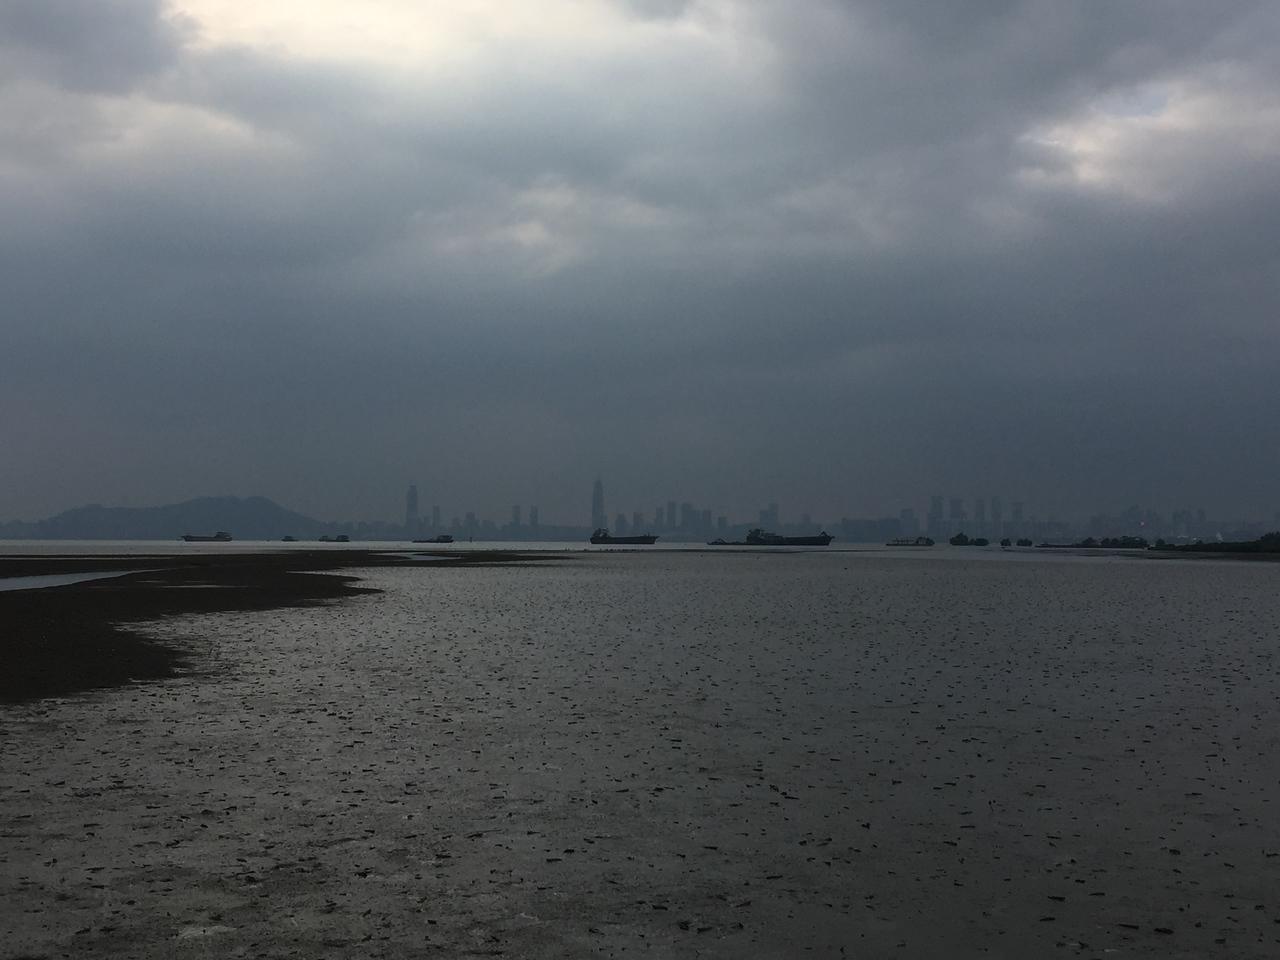 Mai Po mudflats